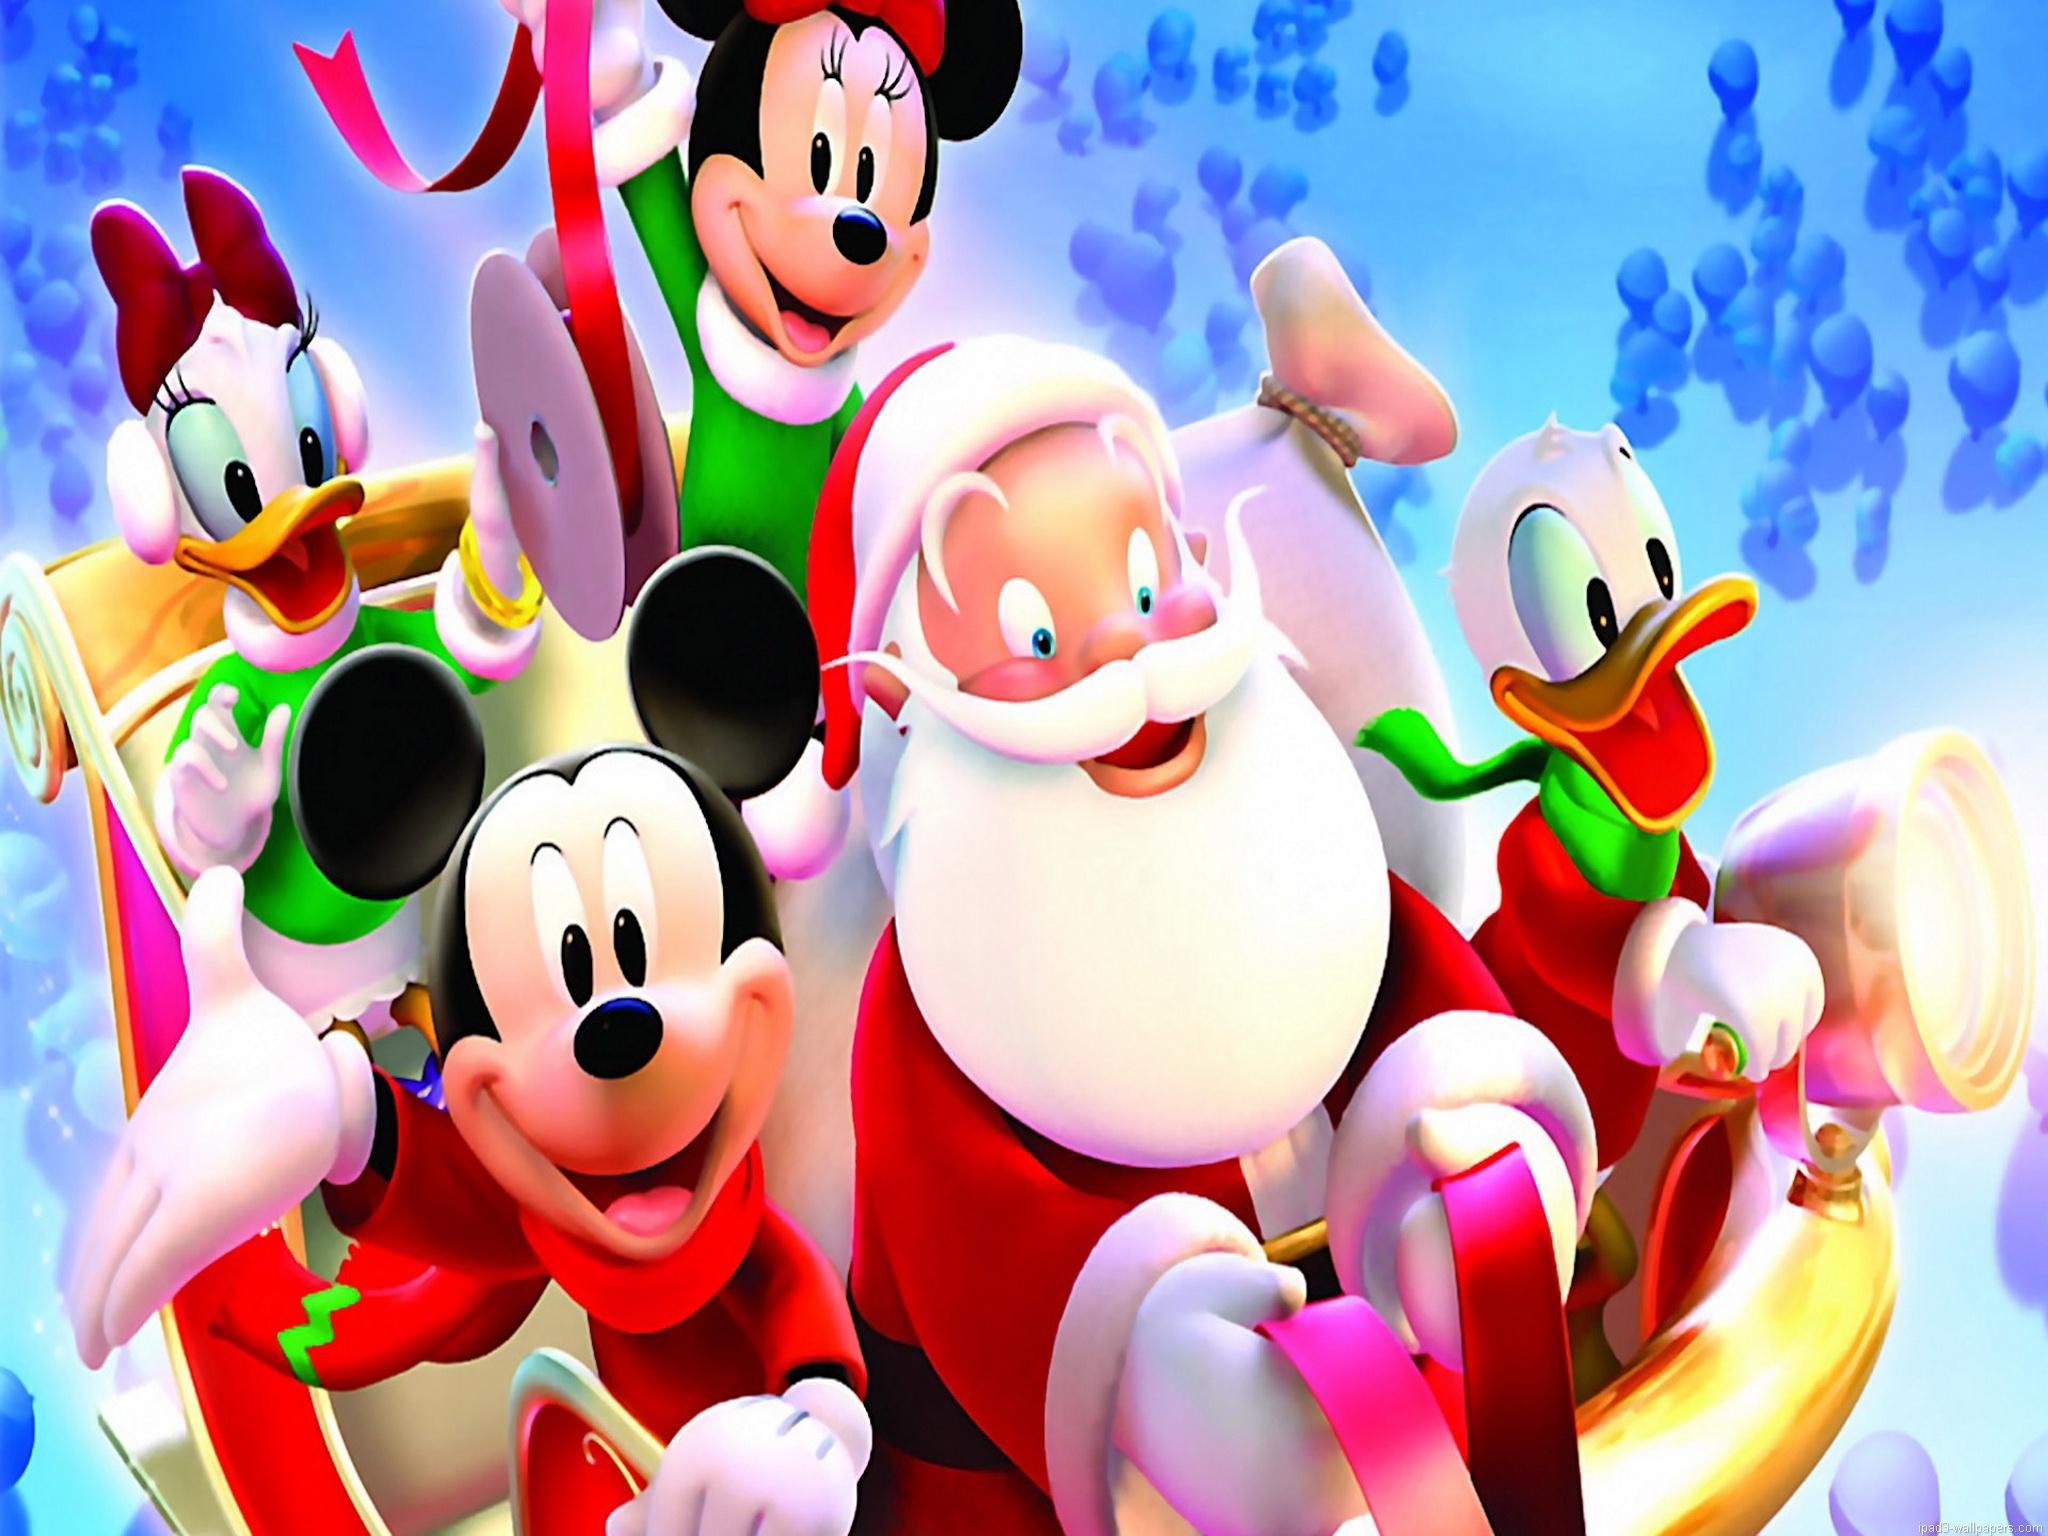 Holiday Wallpaper For Ipad: Disney Christmas Wallpaper For IPad